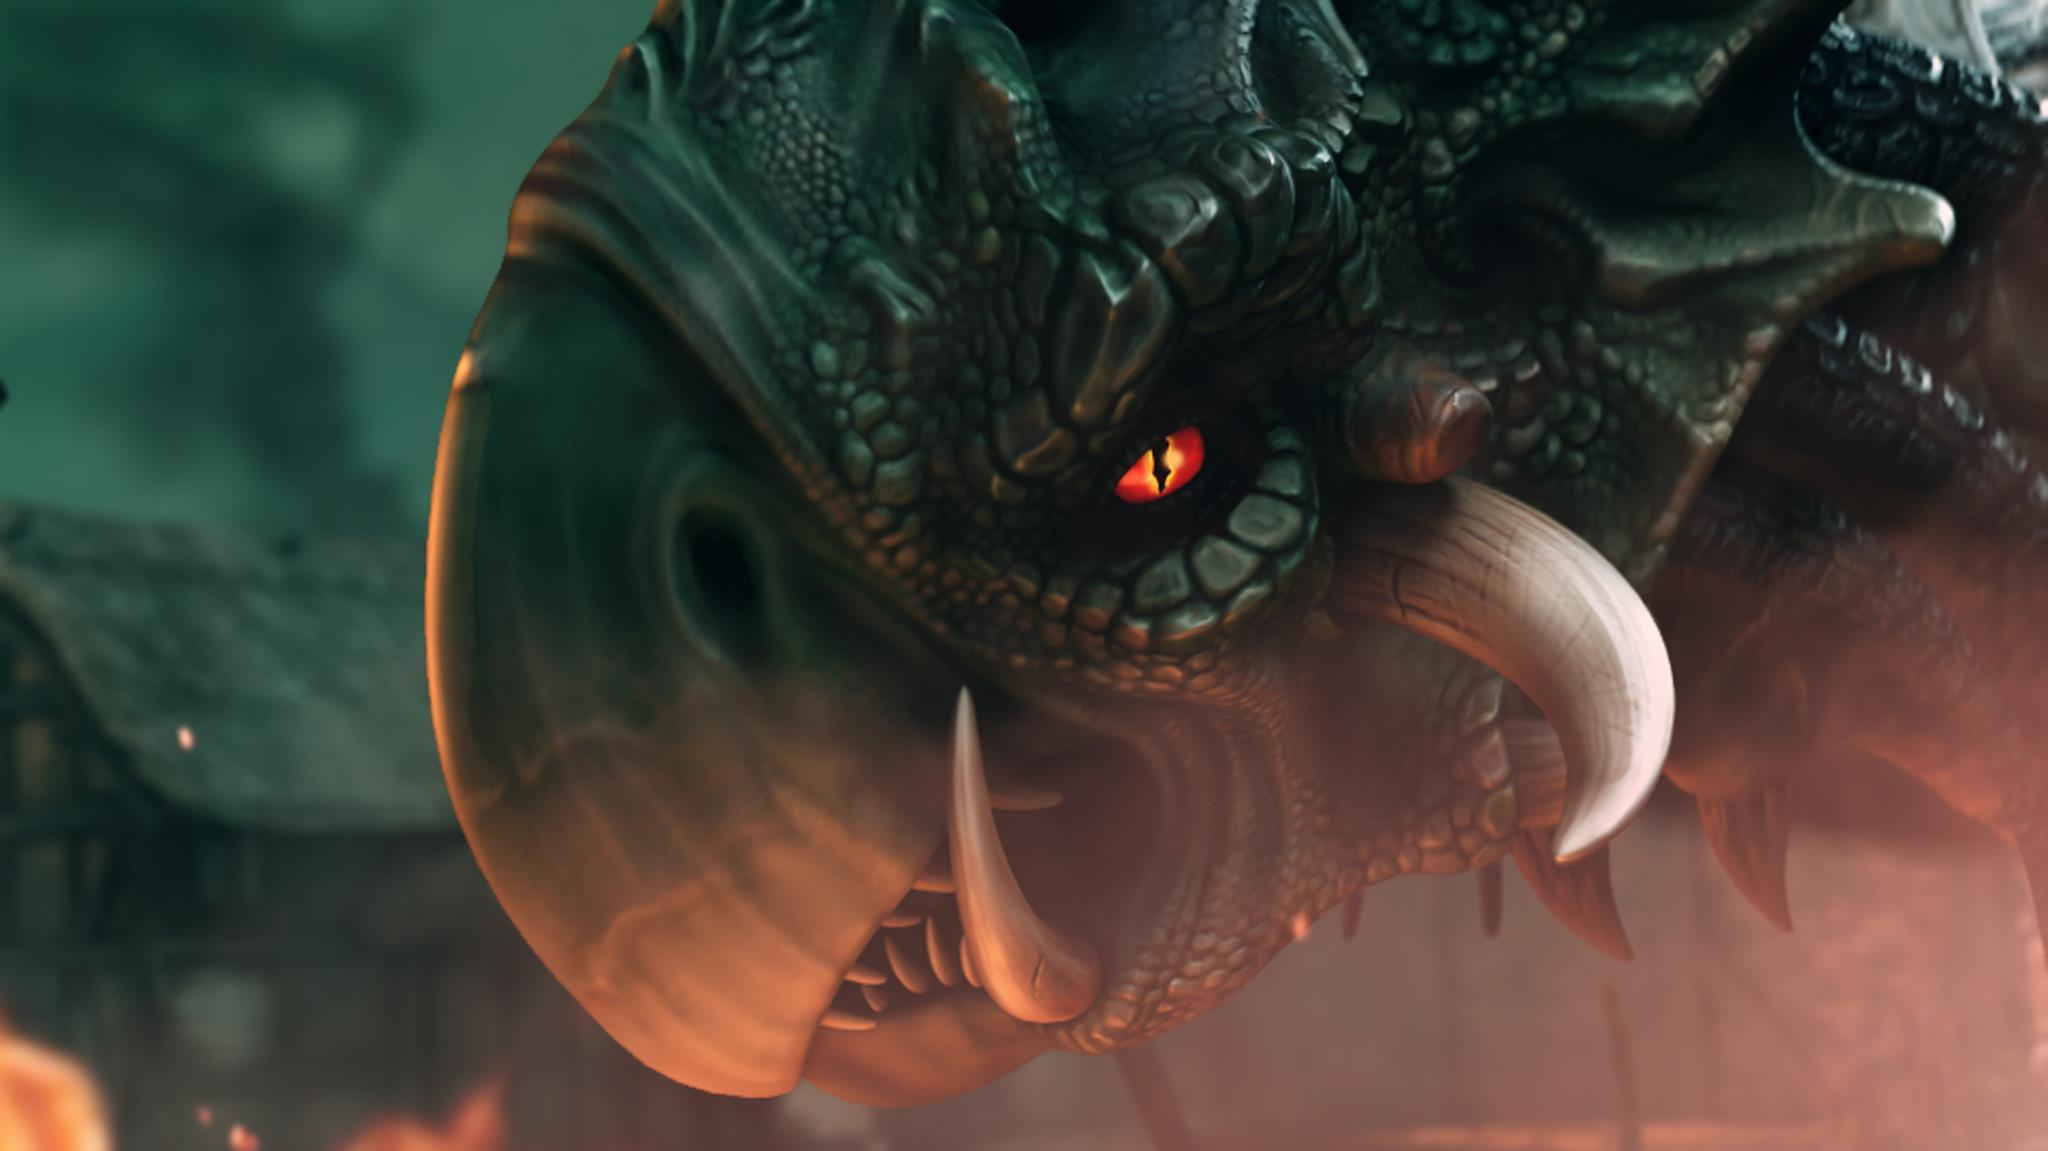 Dragon Wars: Fire & Fury